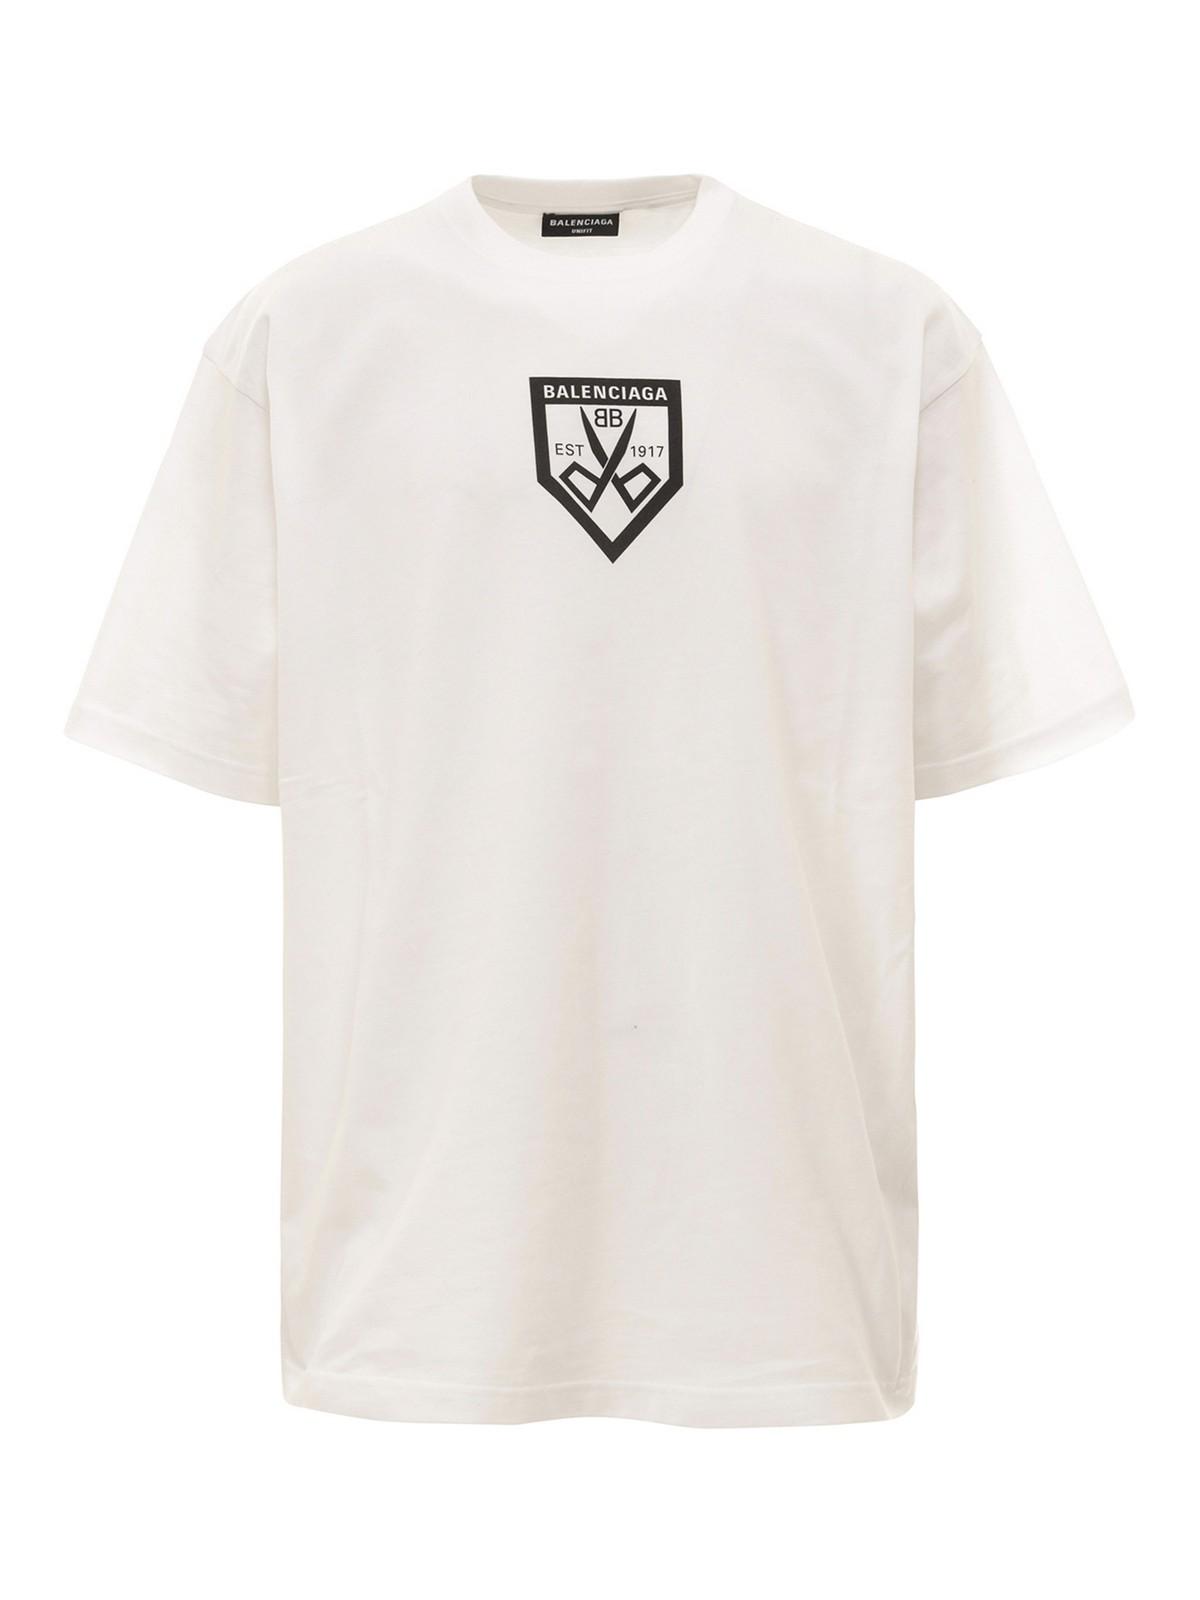 Balenciaga T-shirts SCISSORS FLATGROUND T-SHIRT